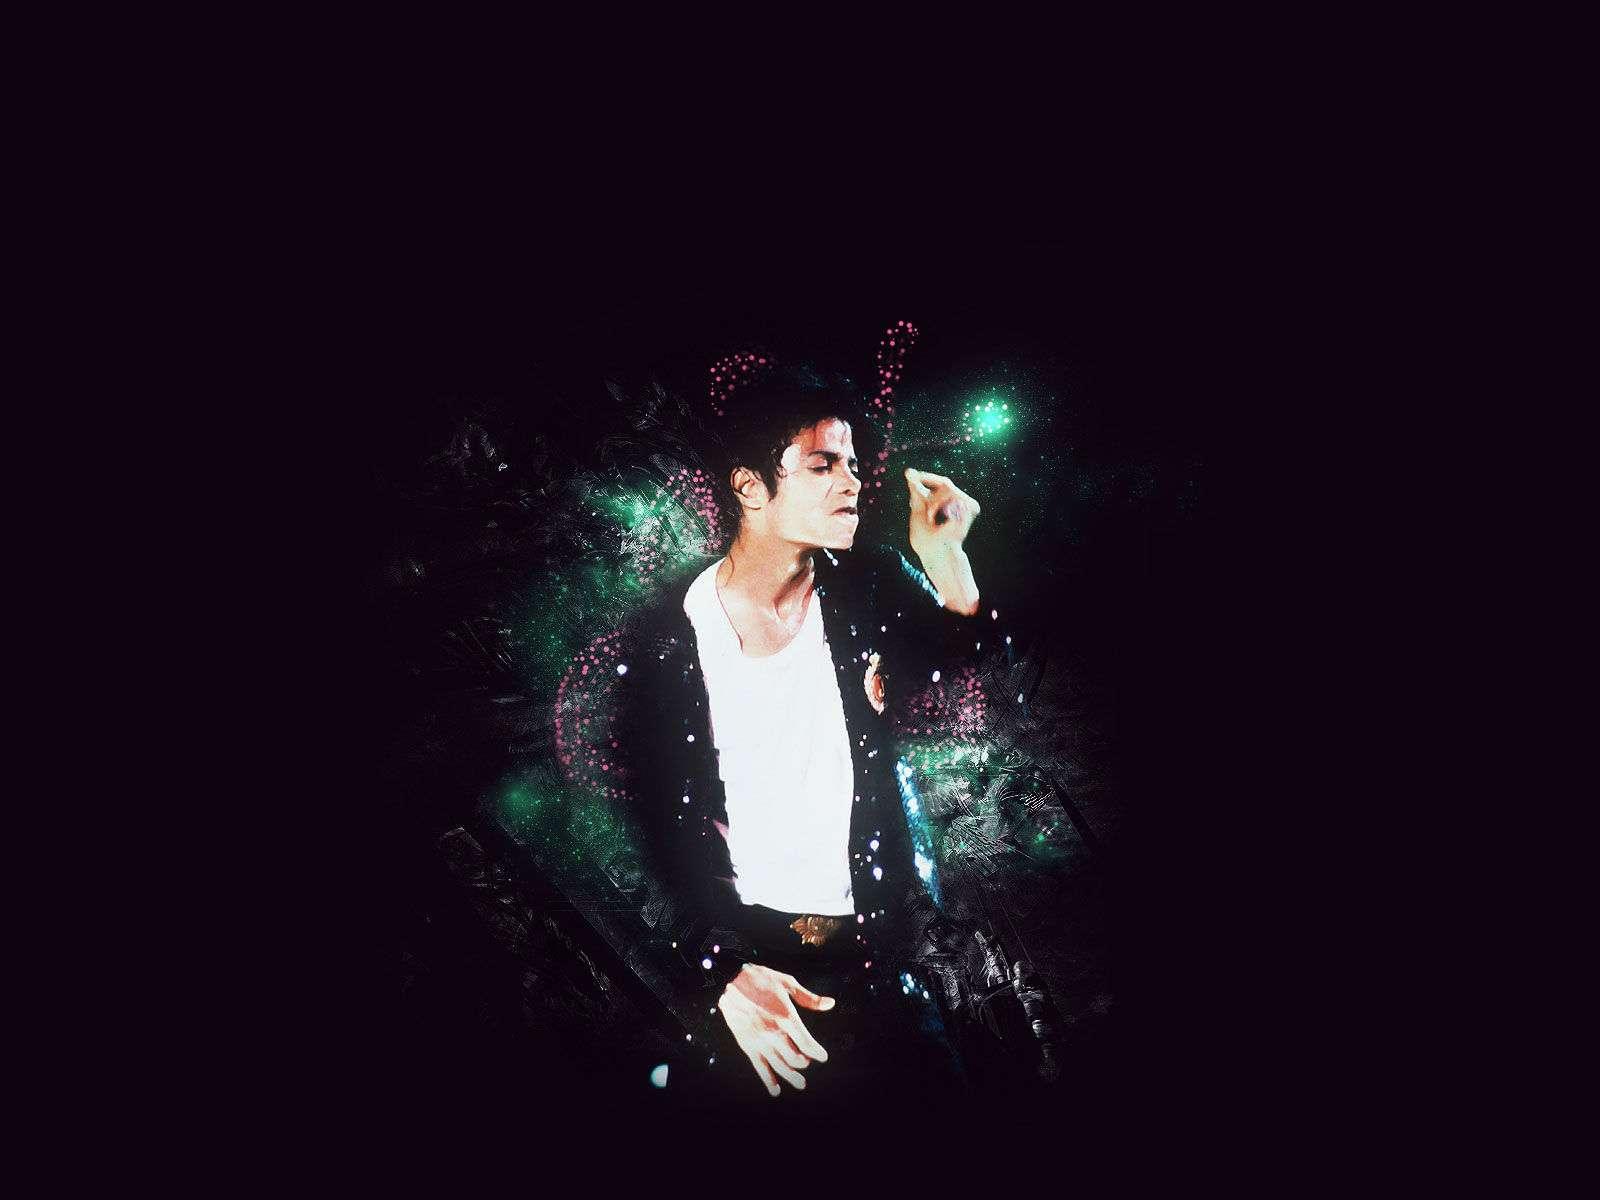 Michael Jackson Wallpaper 024